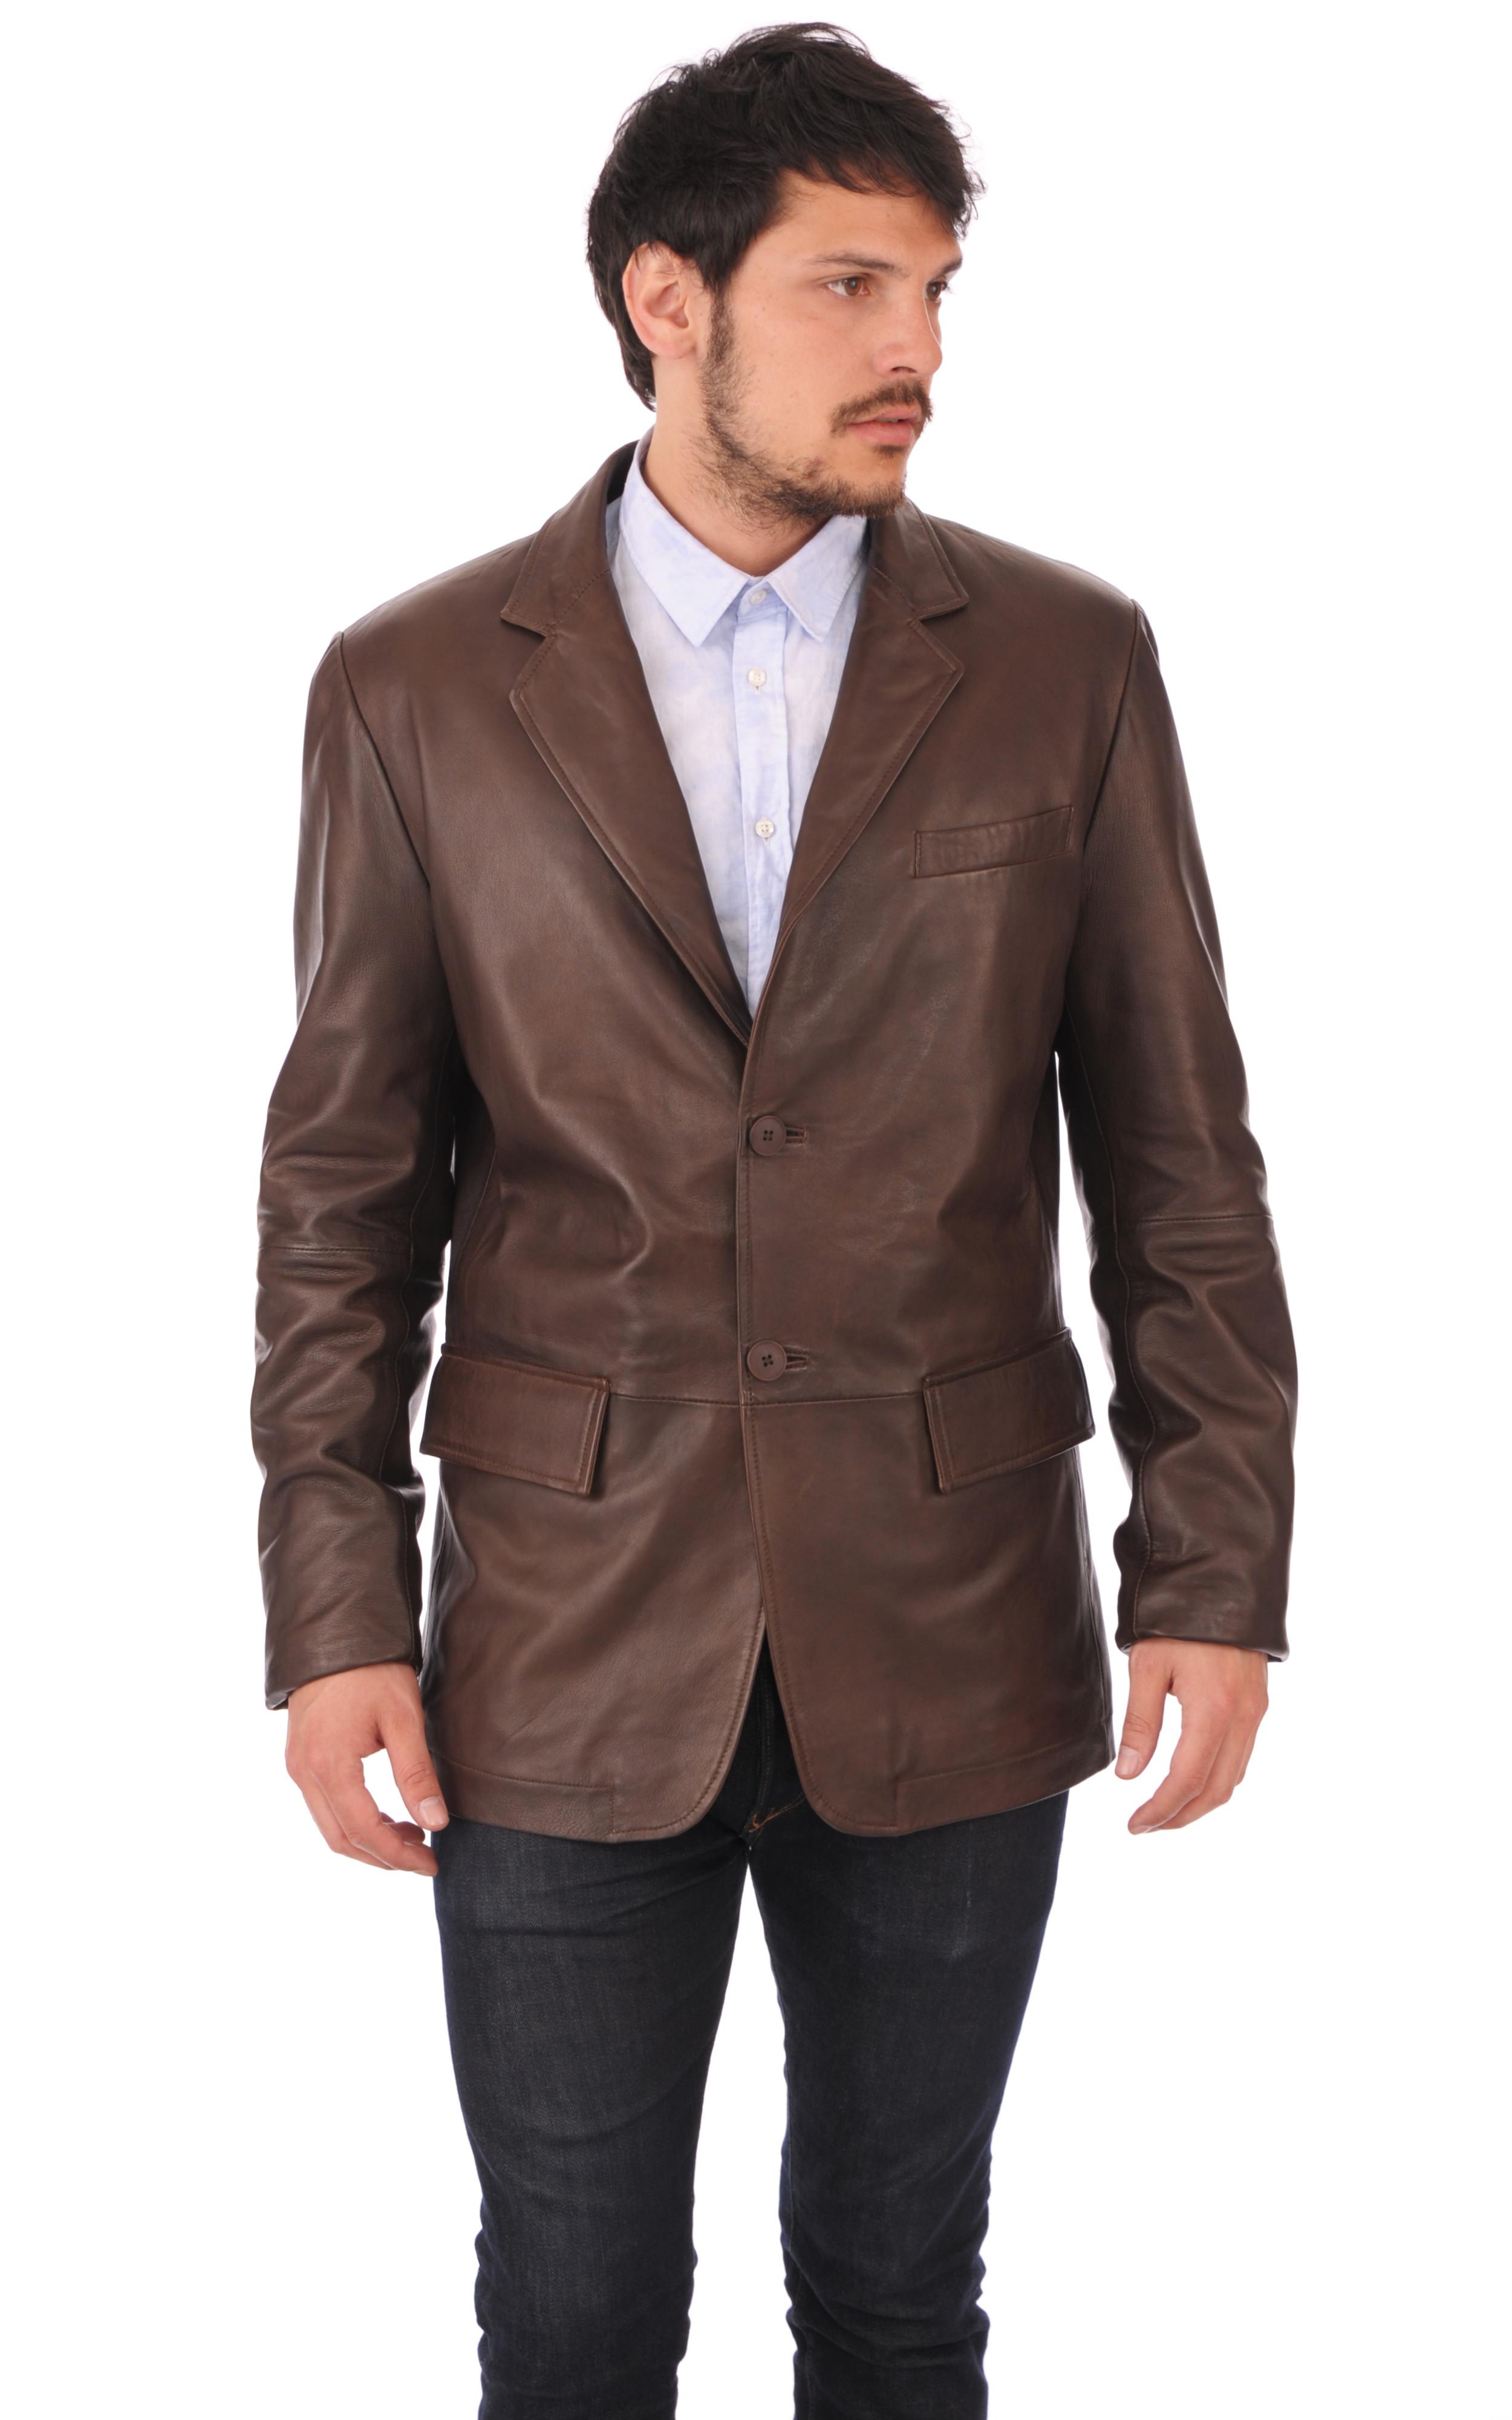 Blazer cuir marron homme monteregi la canadienne veste 3 4 cuir marron fonc - Blazer homme marron ...